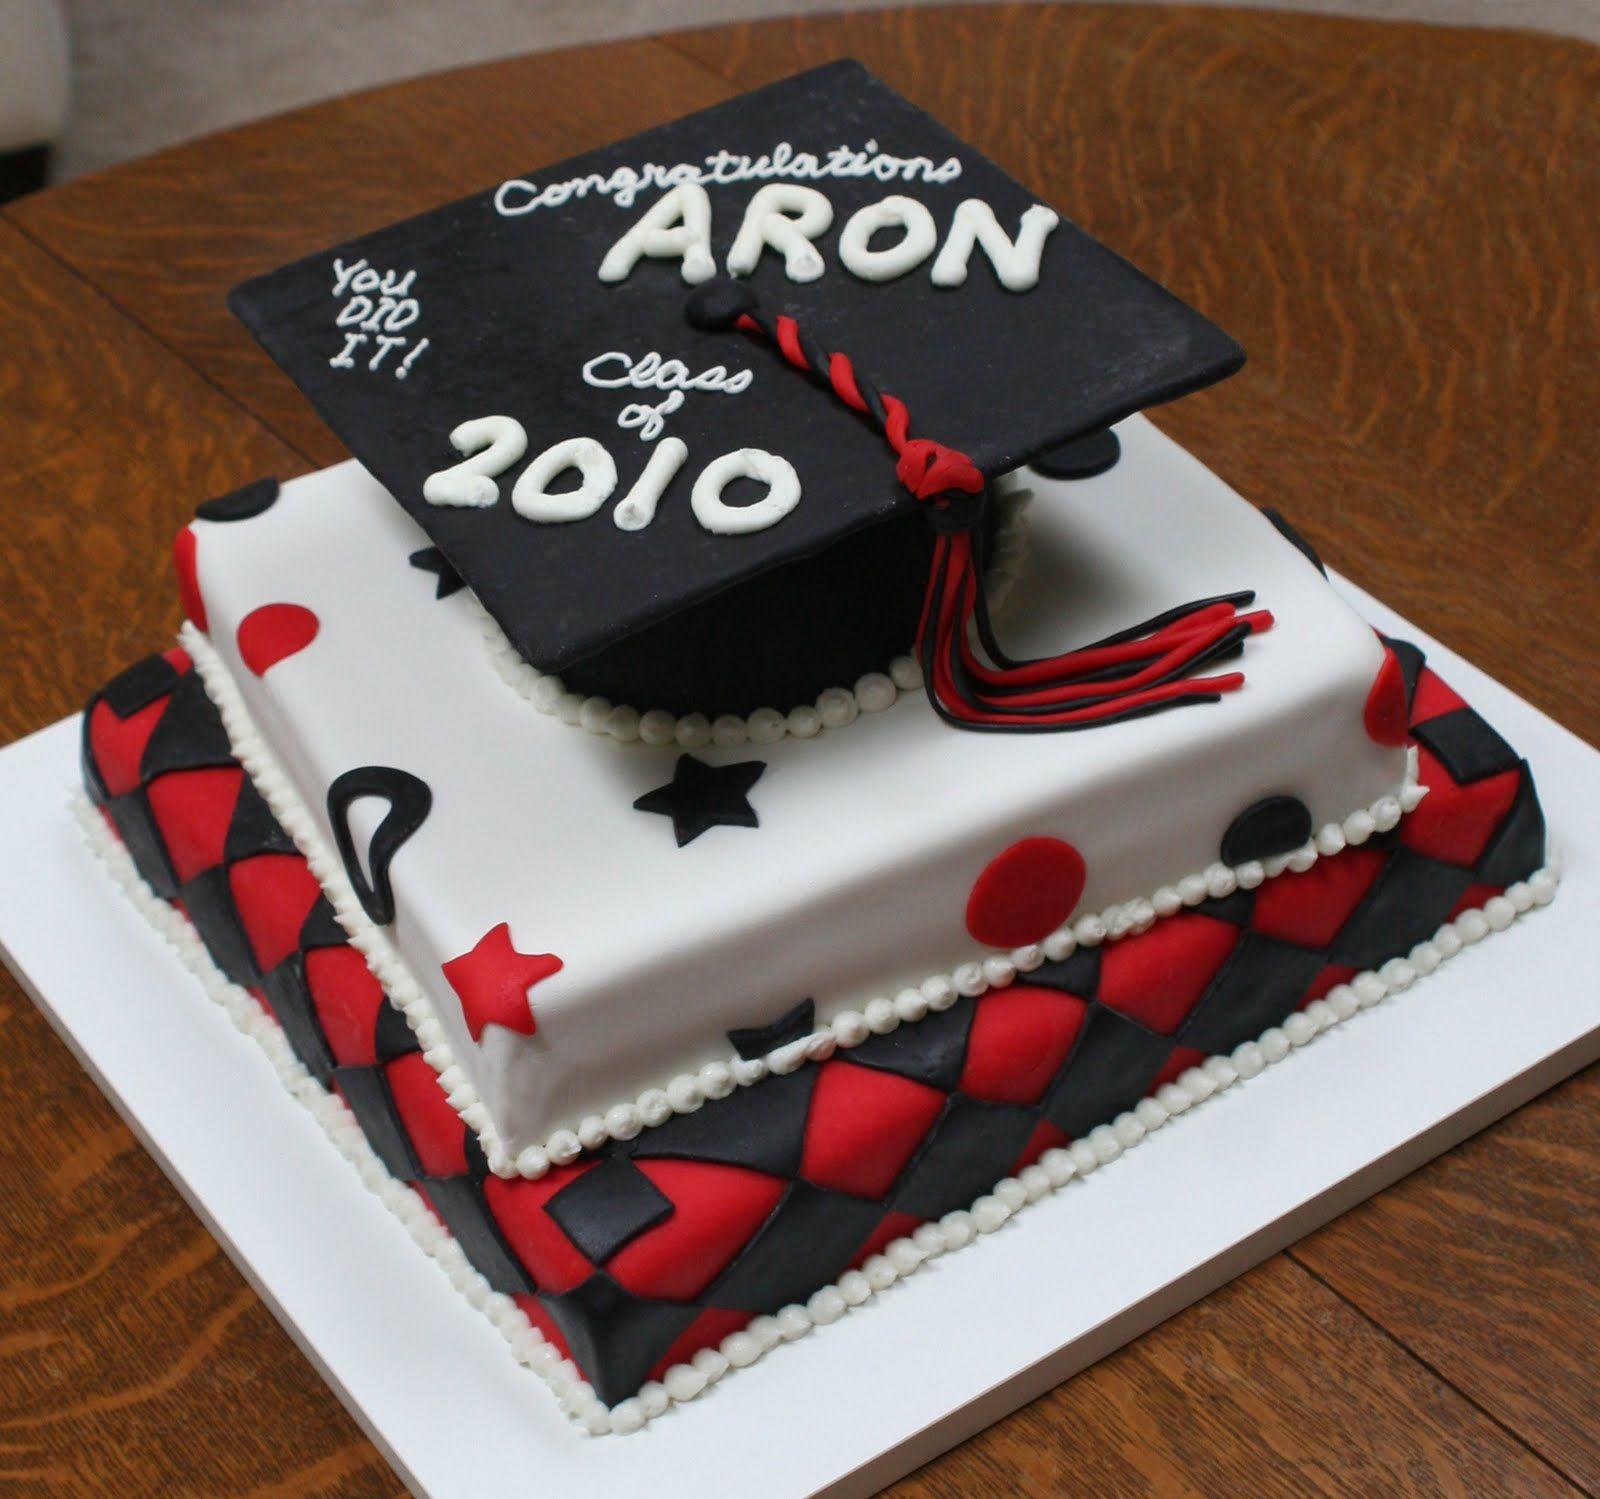 Graduation Cake Recipes Pictures : Graduation cake recipes easy - Best cake recipes